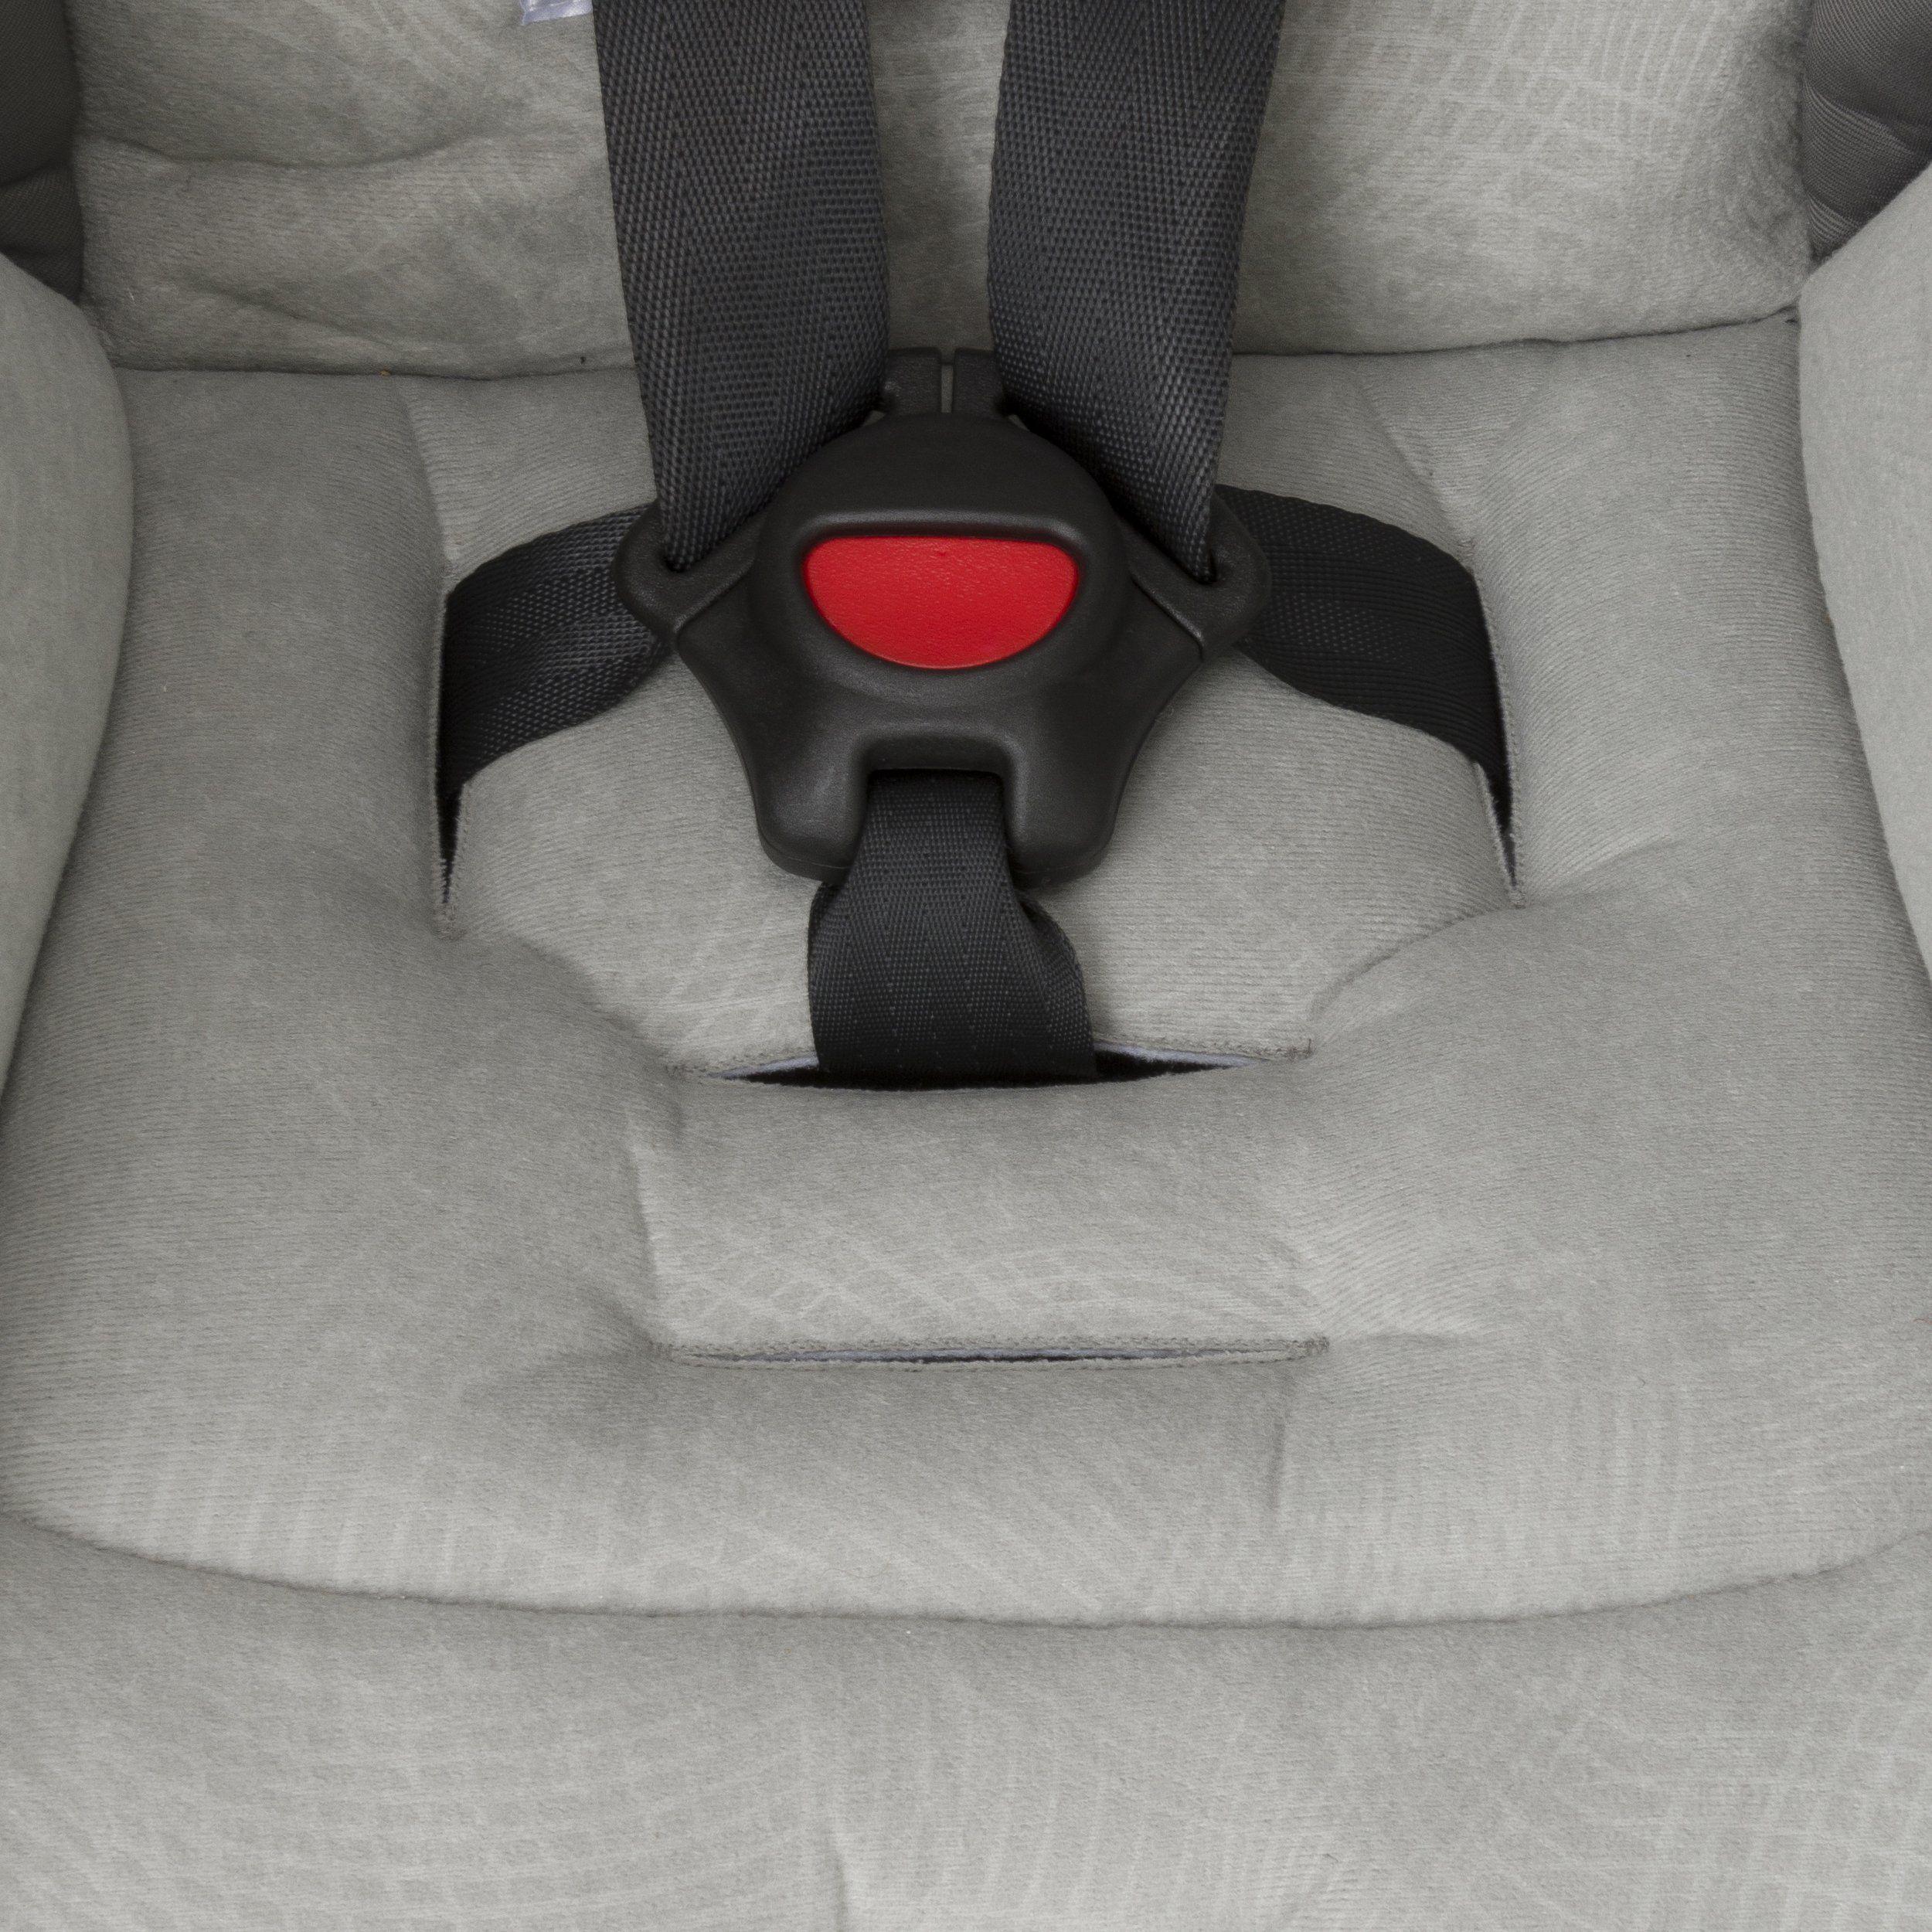 Evenflo SureRide DLX Convertible Car Seat Paxton